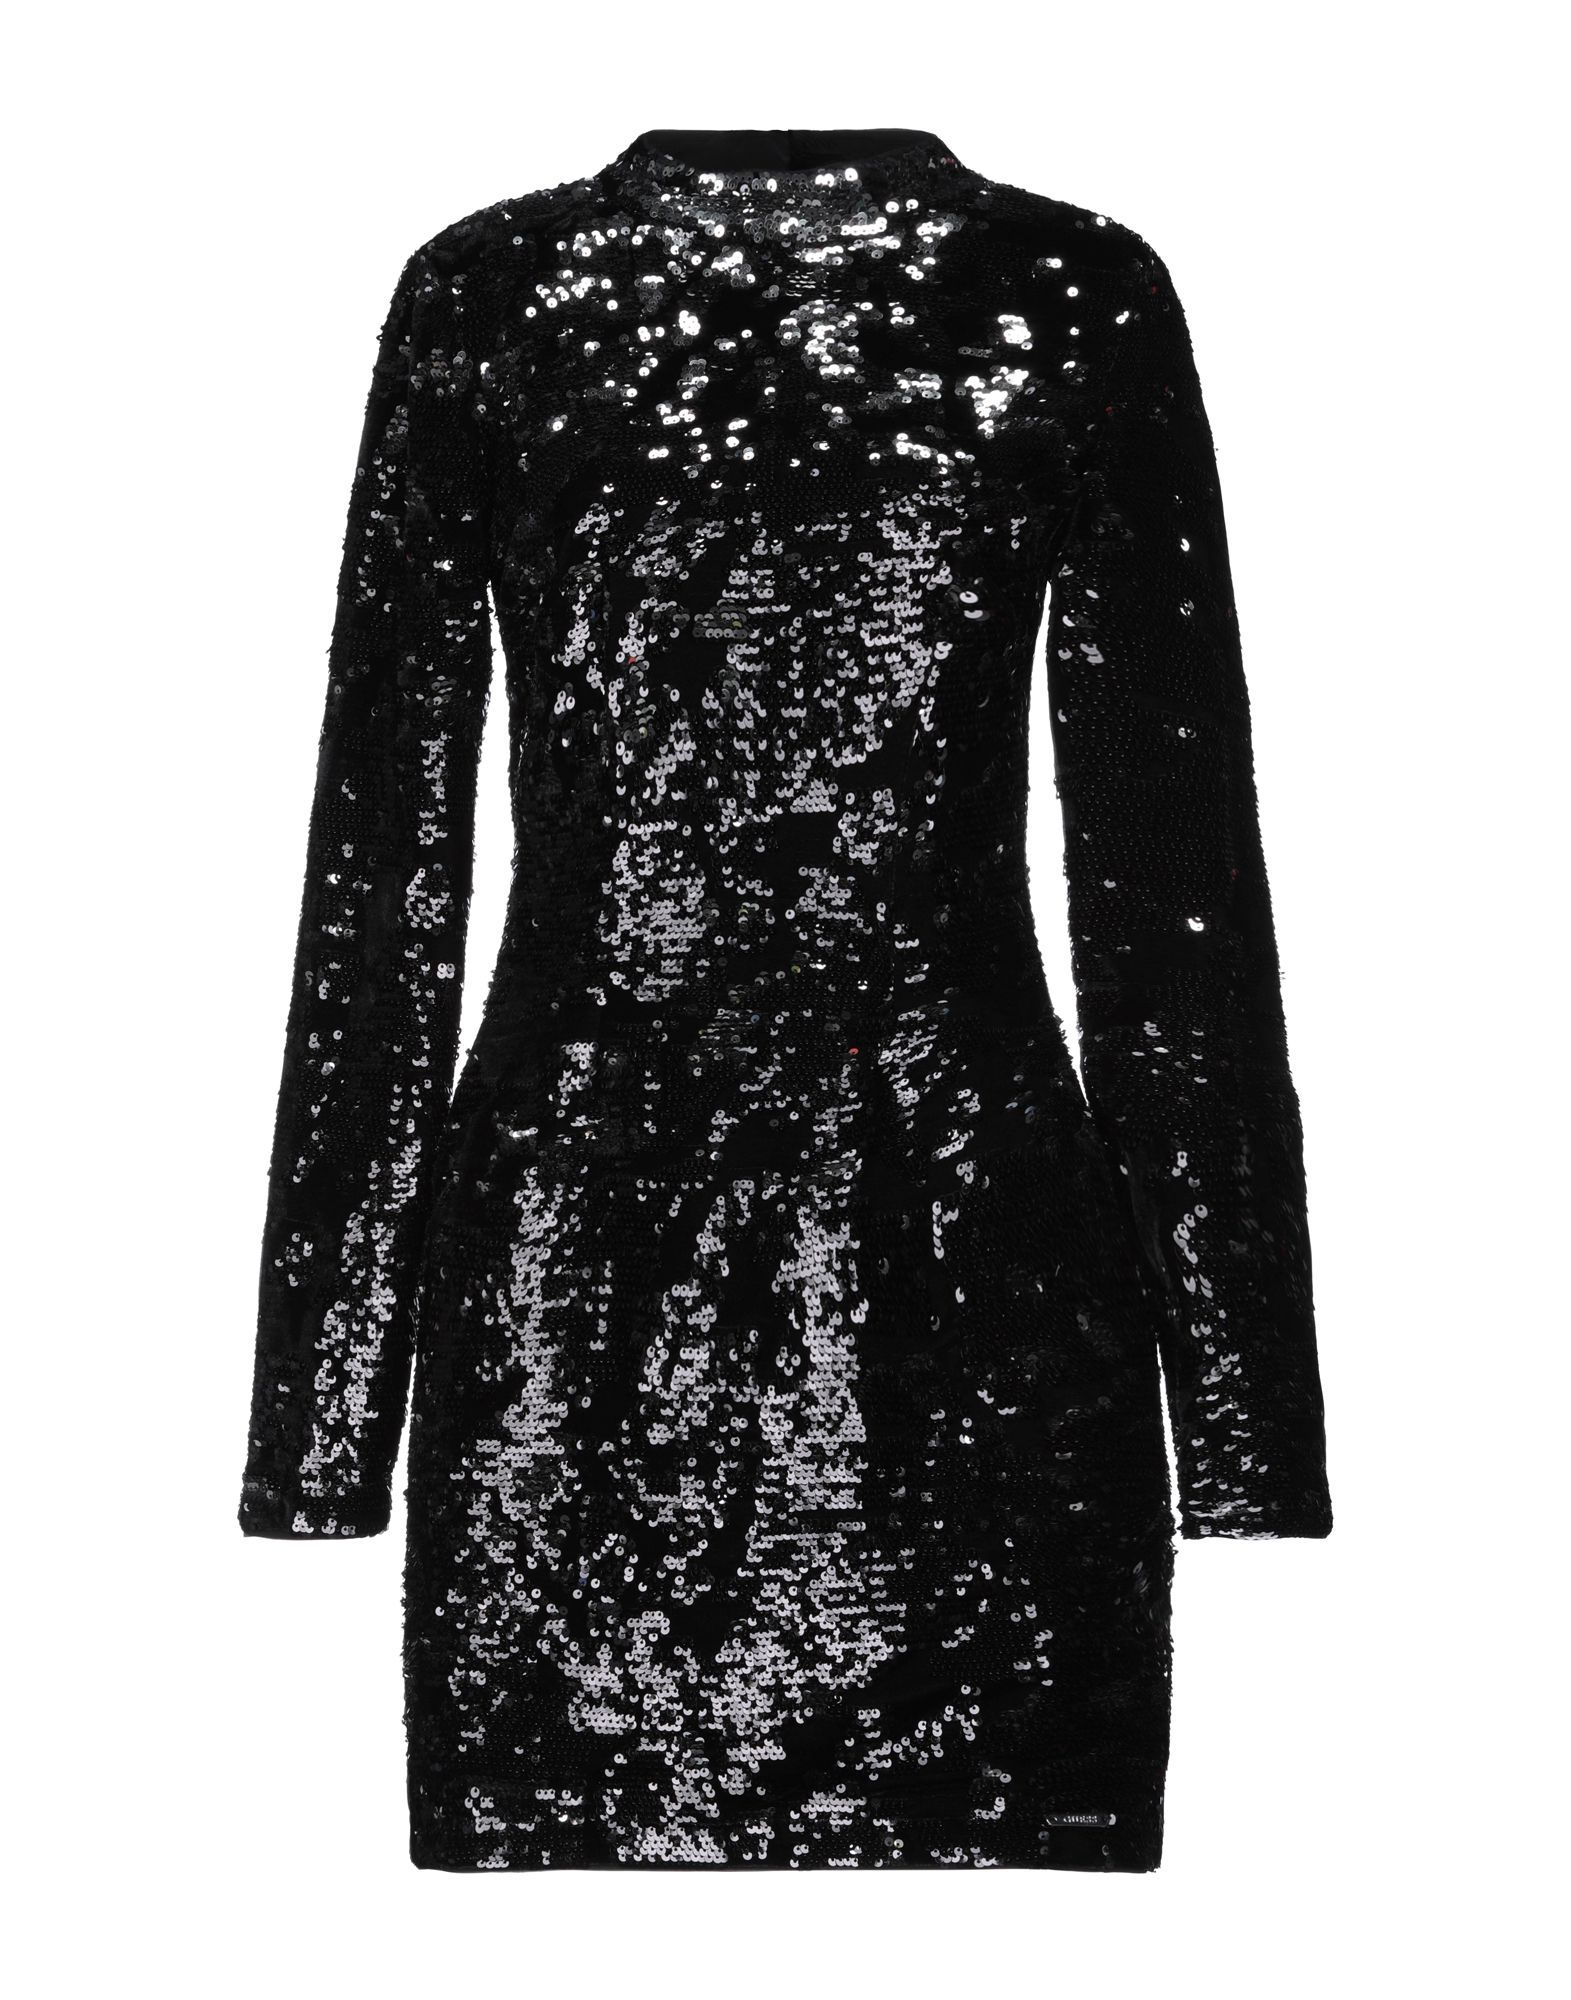 Guess Black Sequin Long Sleeve Dress